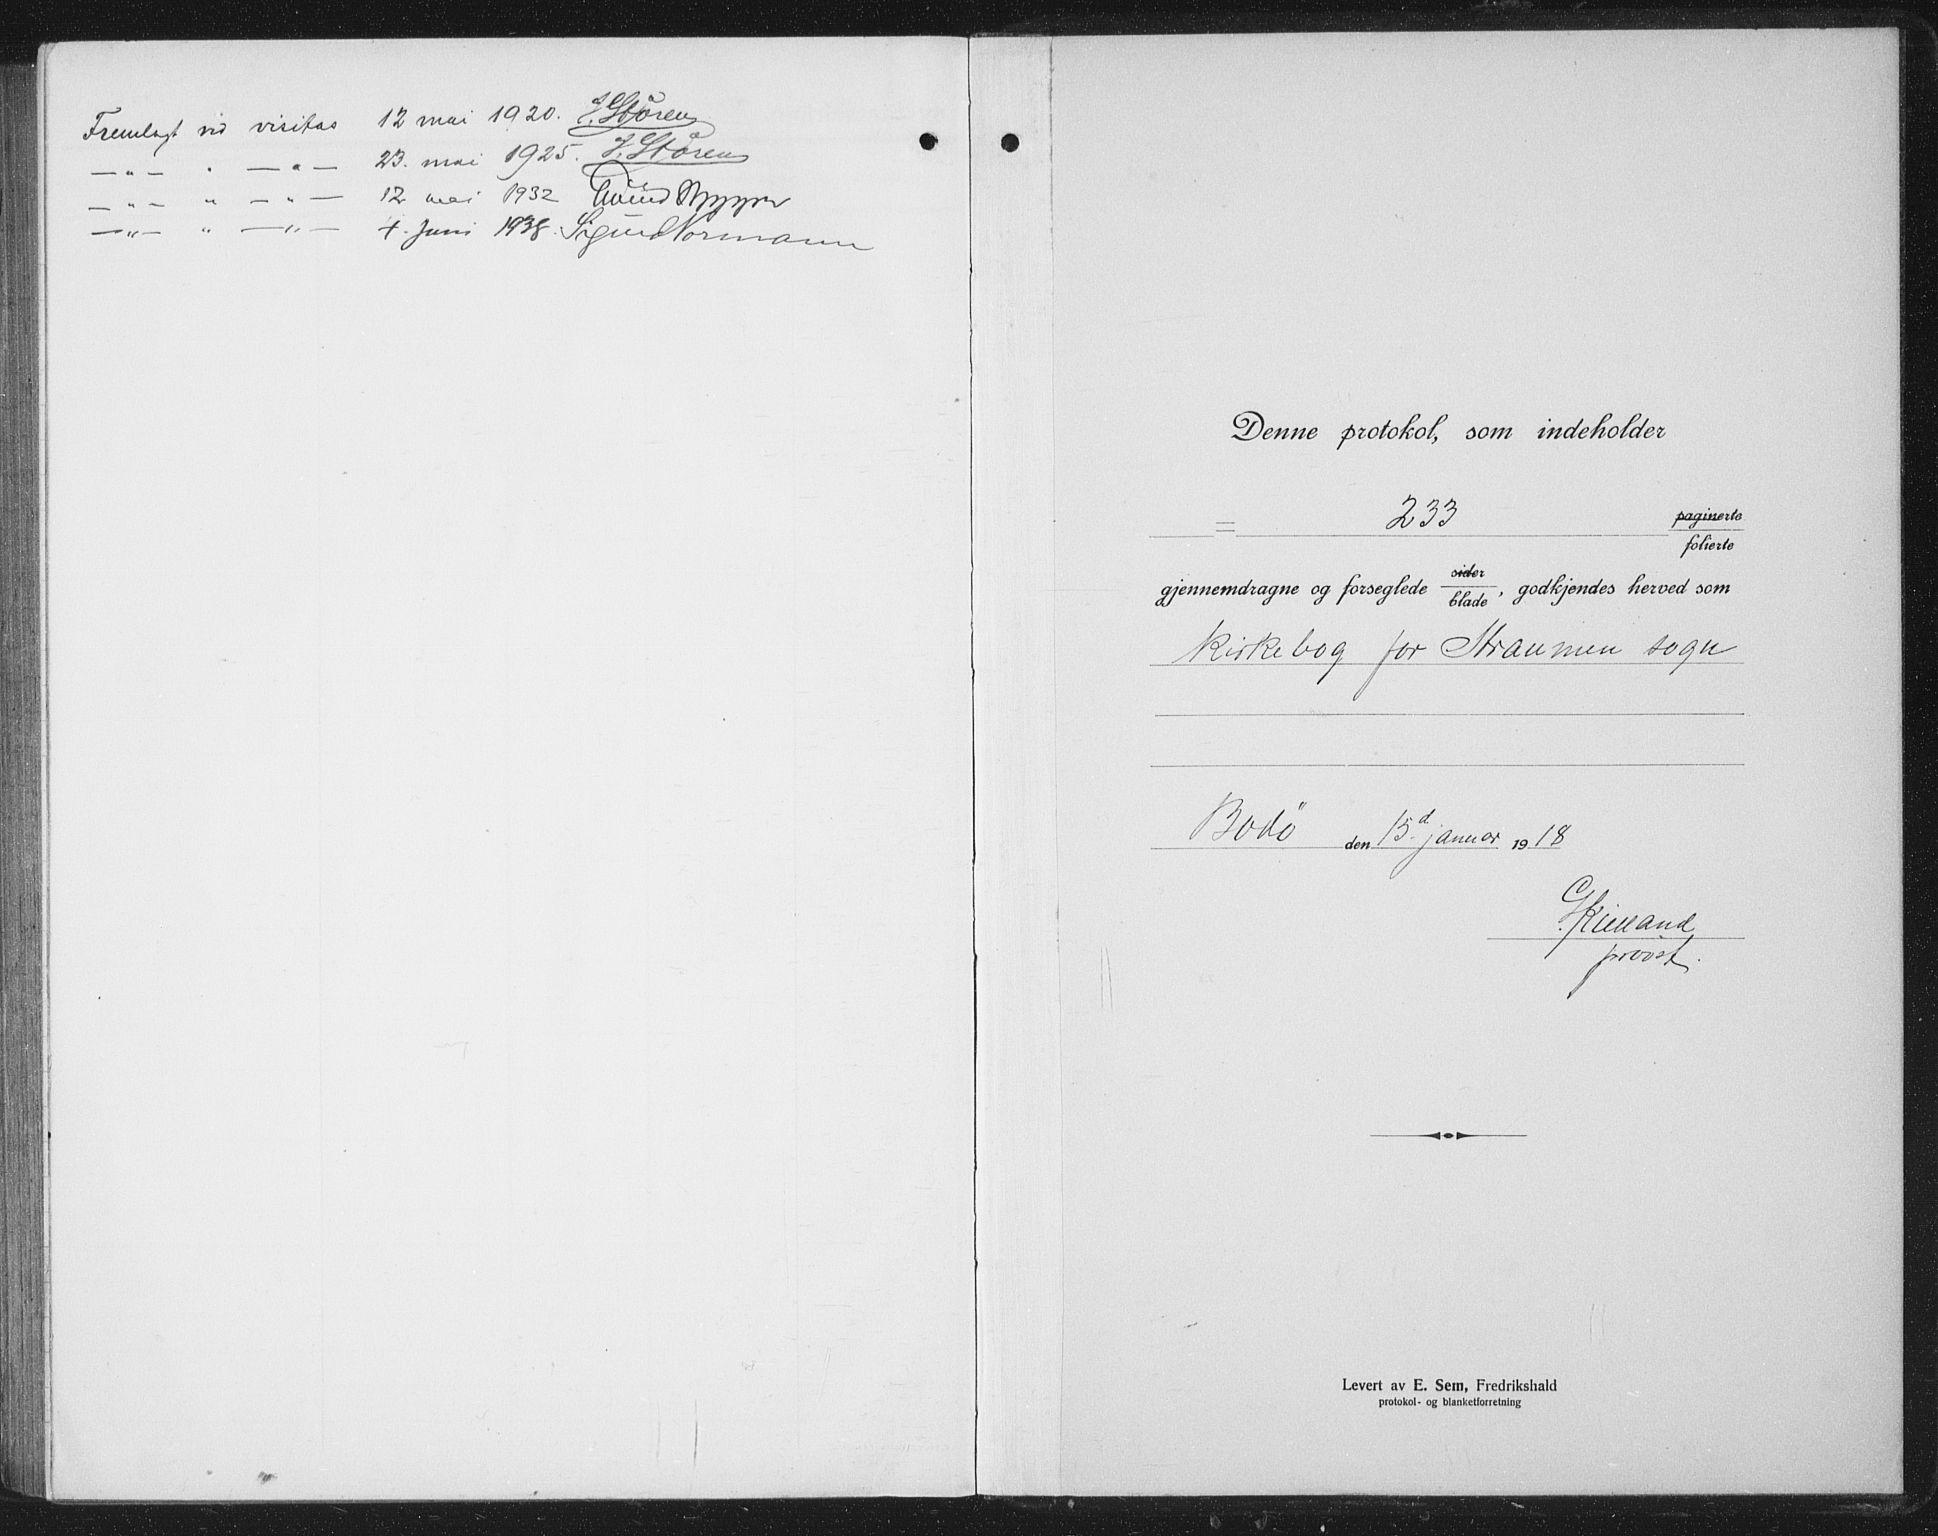 SAT, Ministerialprotokoller, klokkerbøker og fødselsregistre - Nordland, 804/L0089: Klokkerbok nr. 804C02, 1918-1935